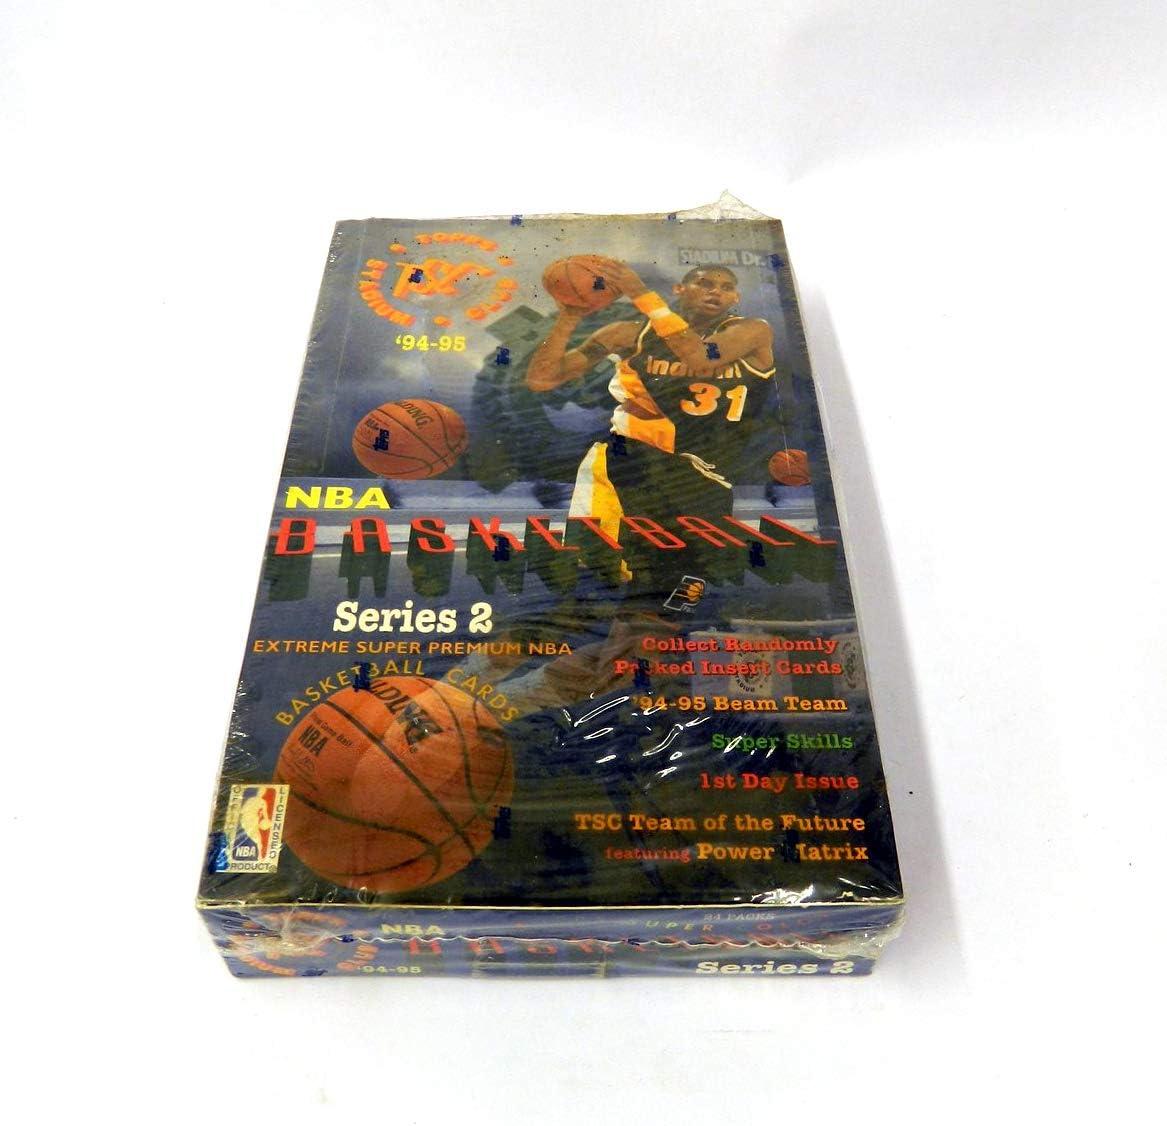 Upper Deck Collectors Choice series 2 baloncesto nba box 1994-95